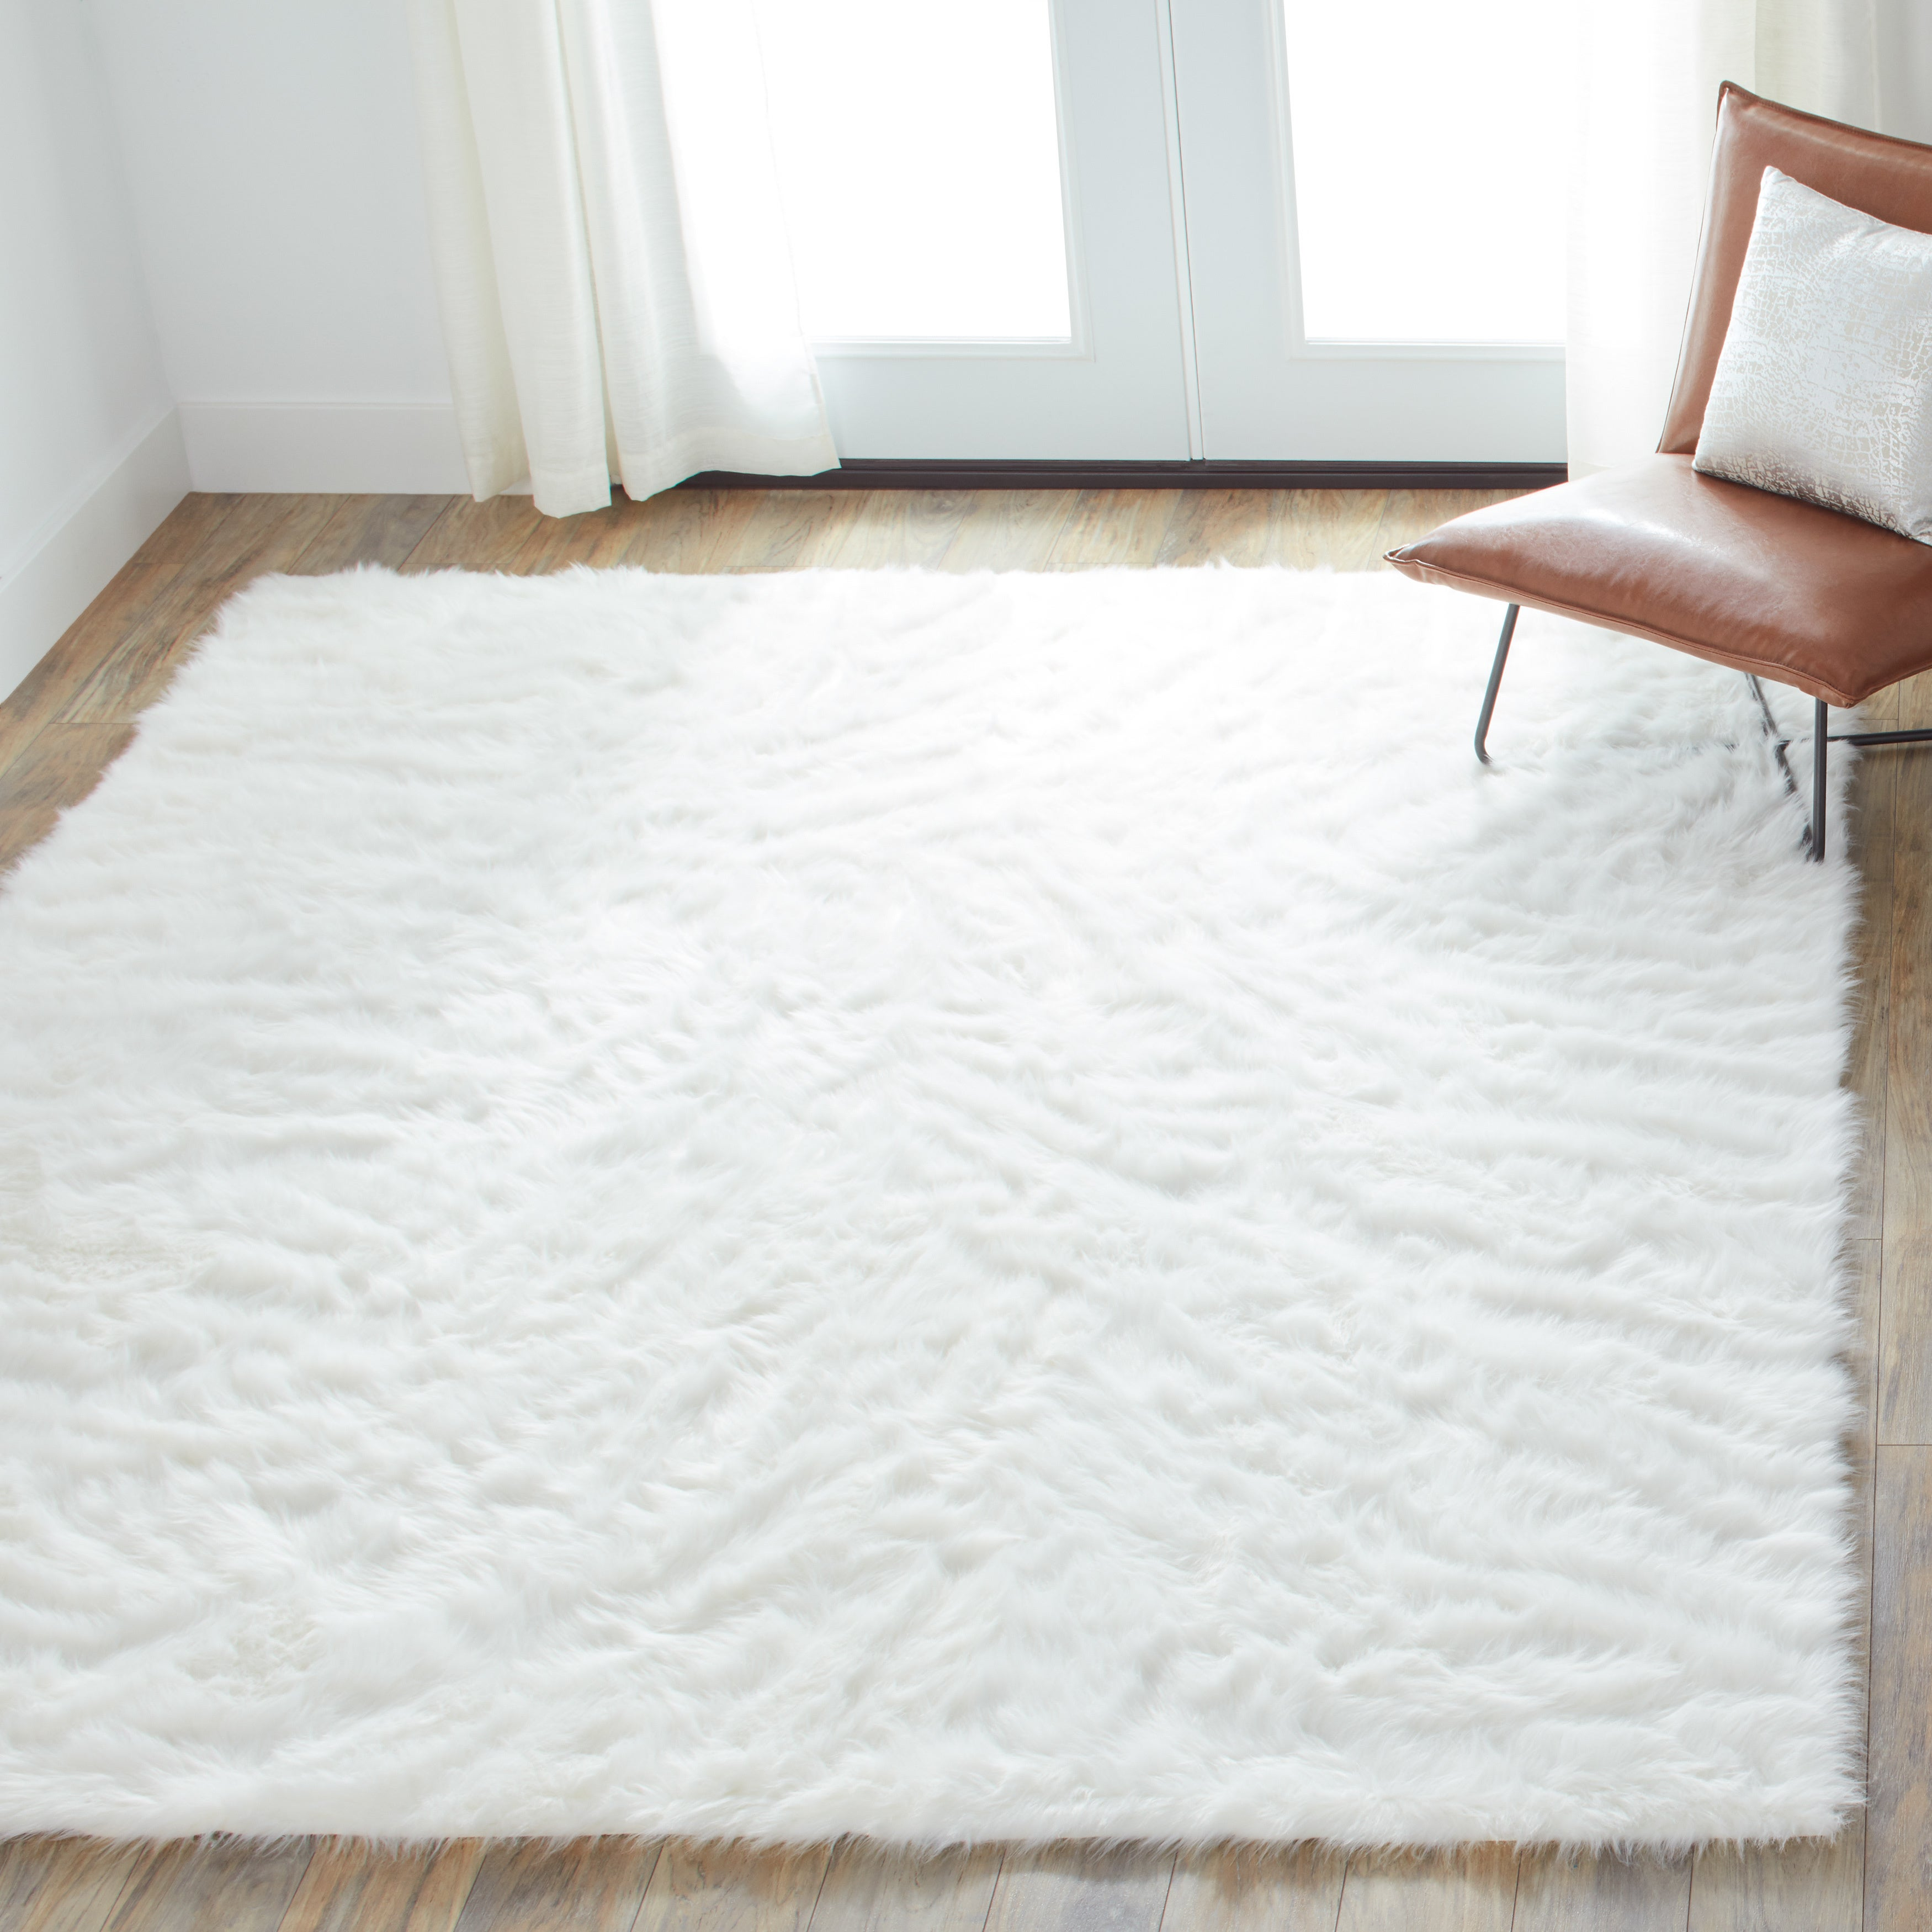 Shop Strick Bolton Verna Faux Sheepskin Ivory White Shag Area Rug